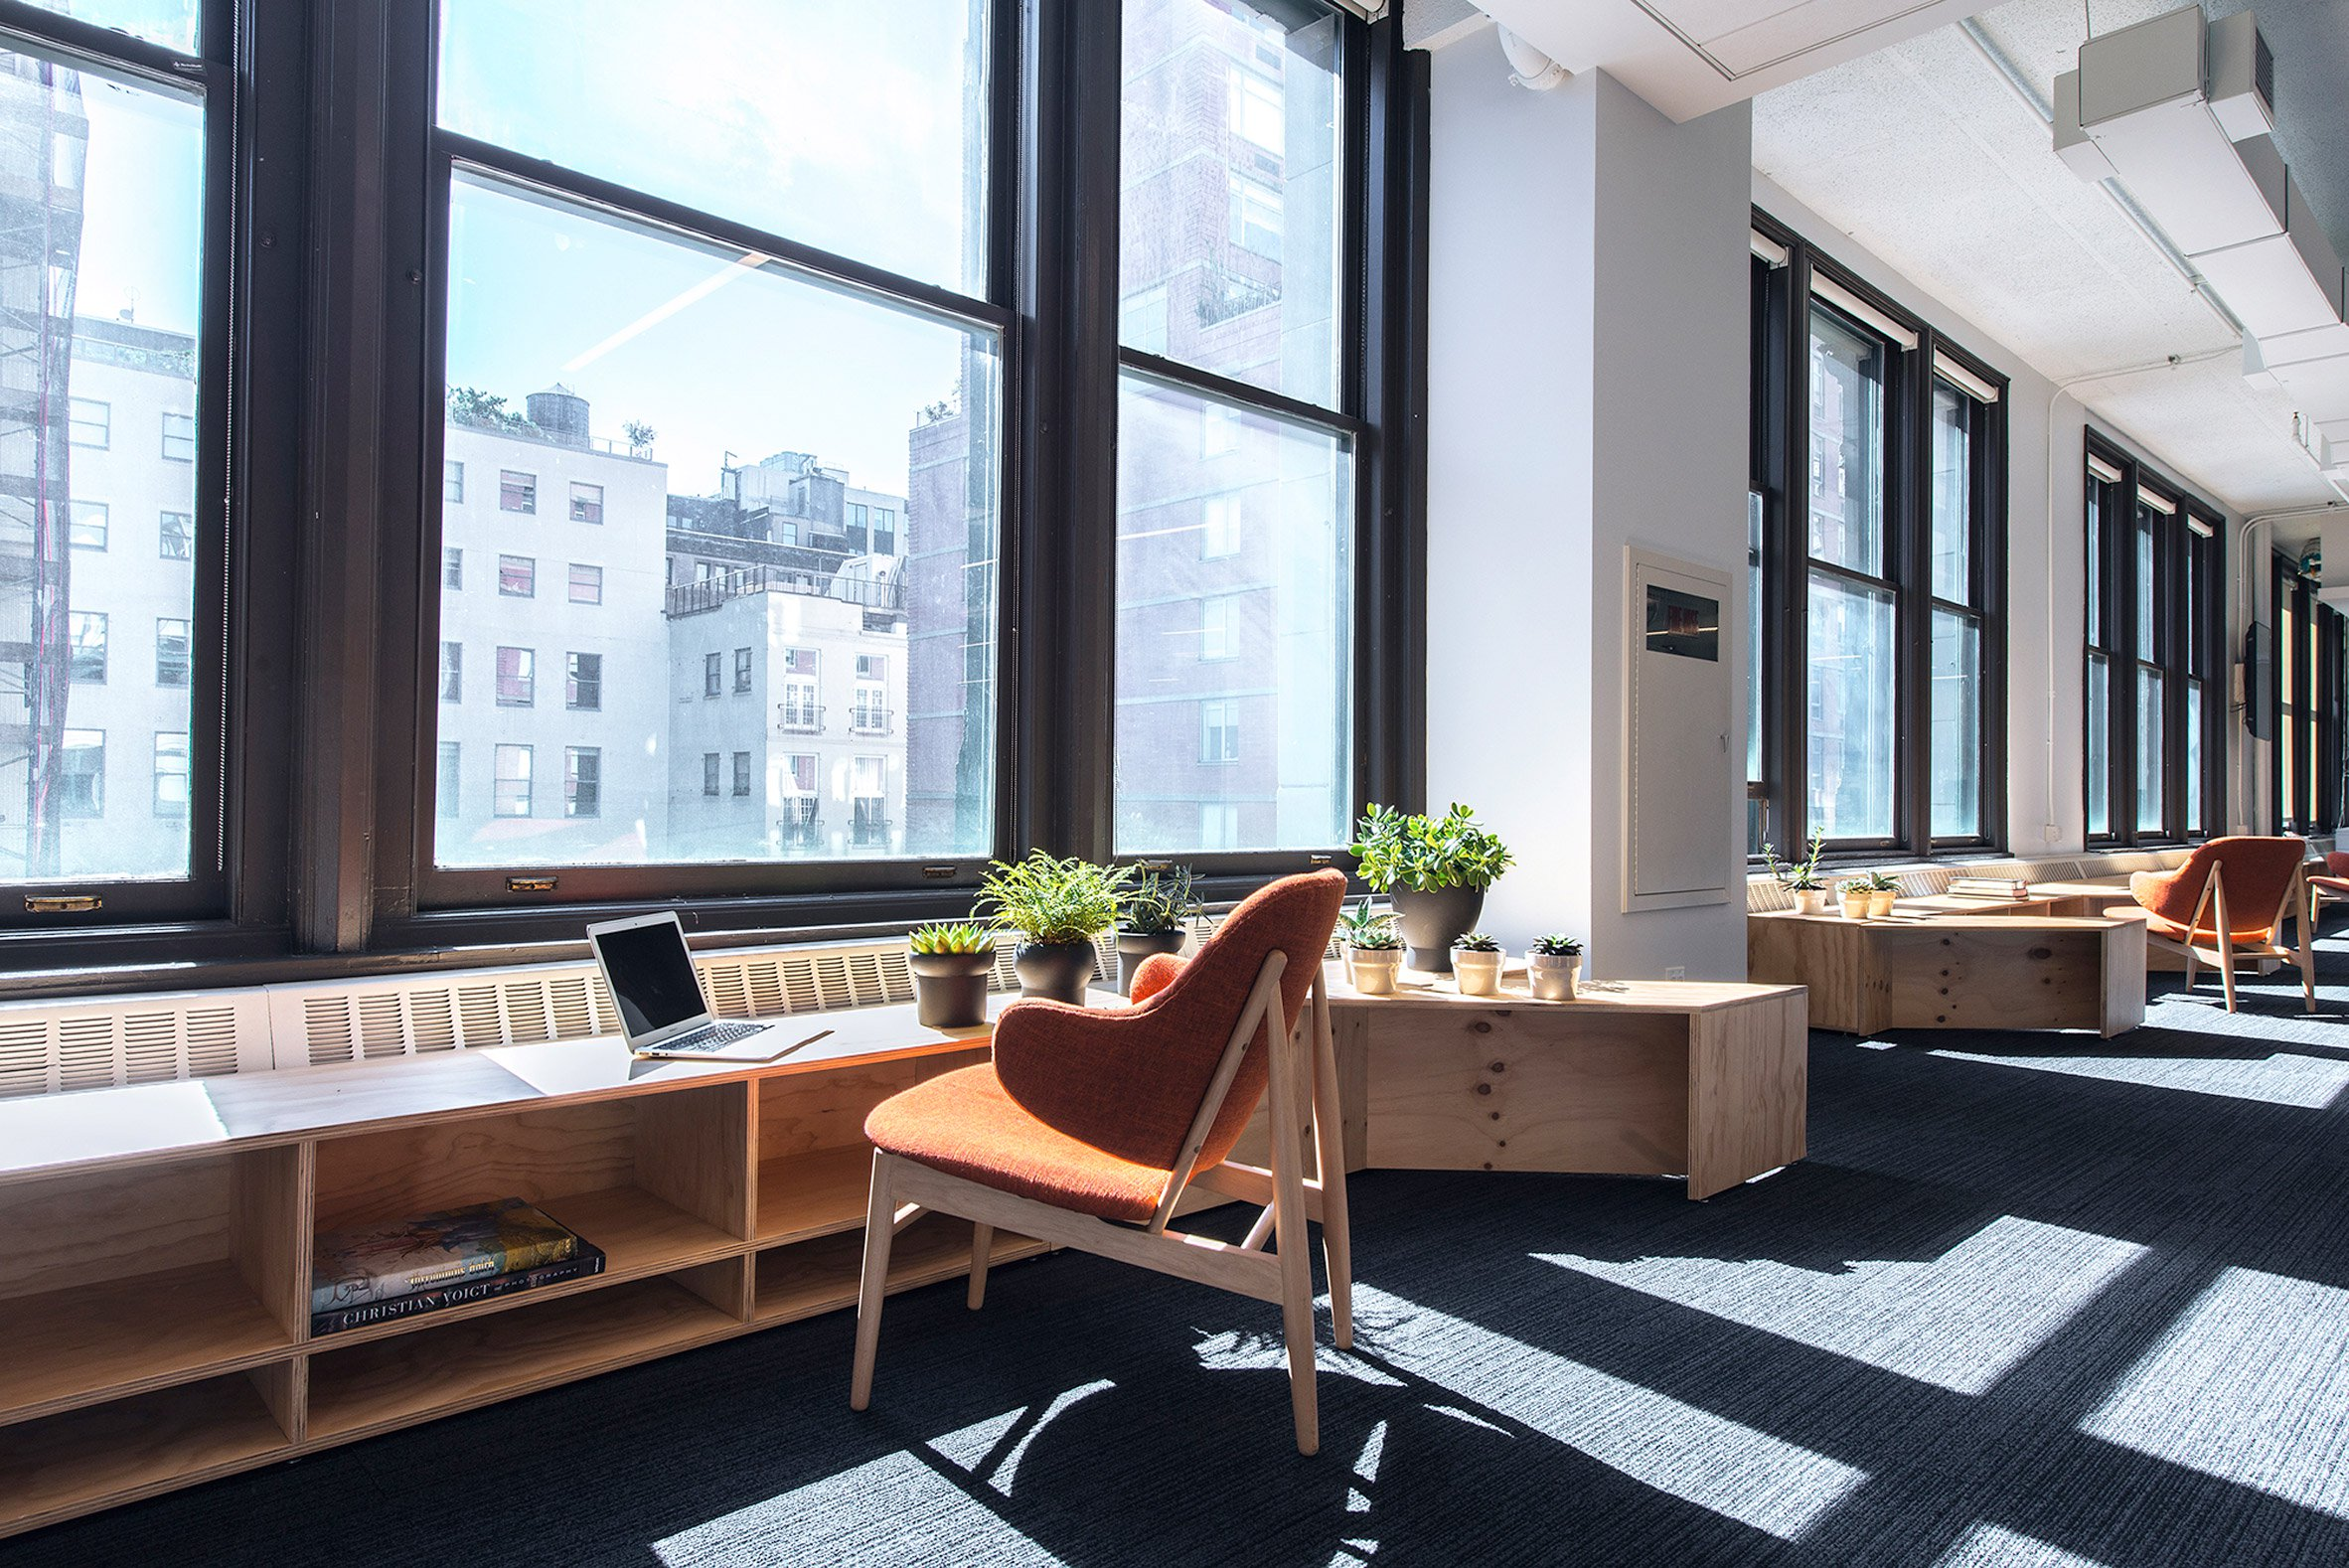 architecture-interiors-offices- manhatten-new-york-design-studia-osnovadesign-osnova-poltava_15